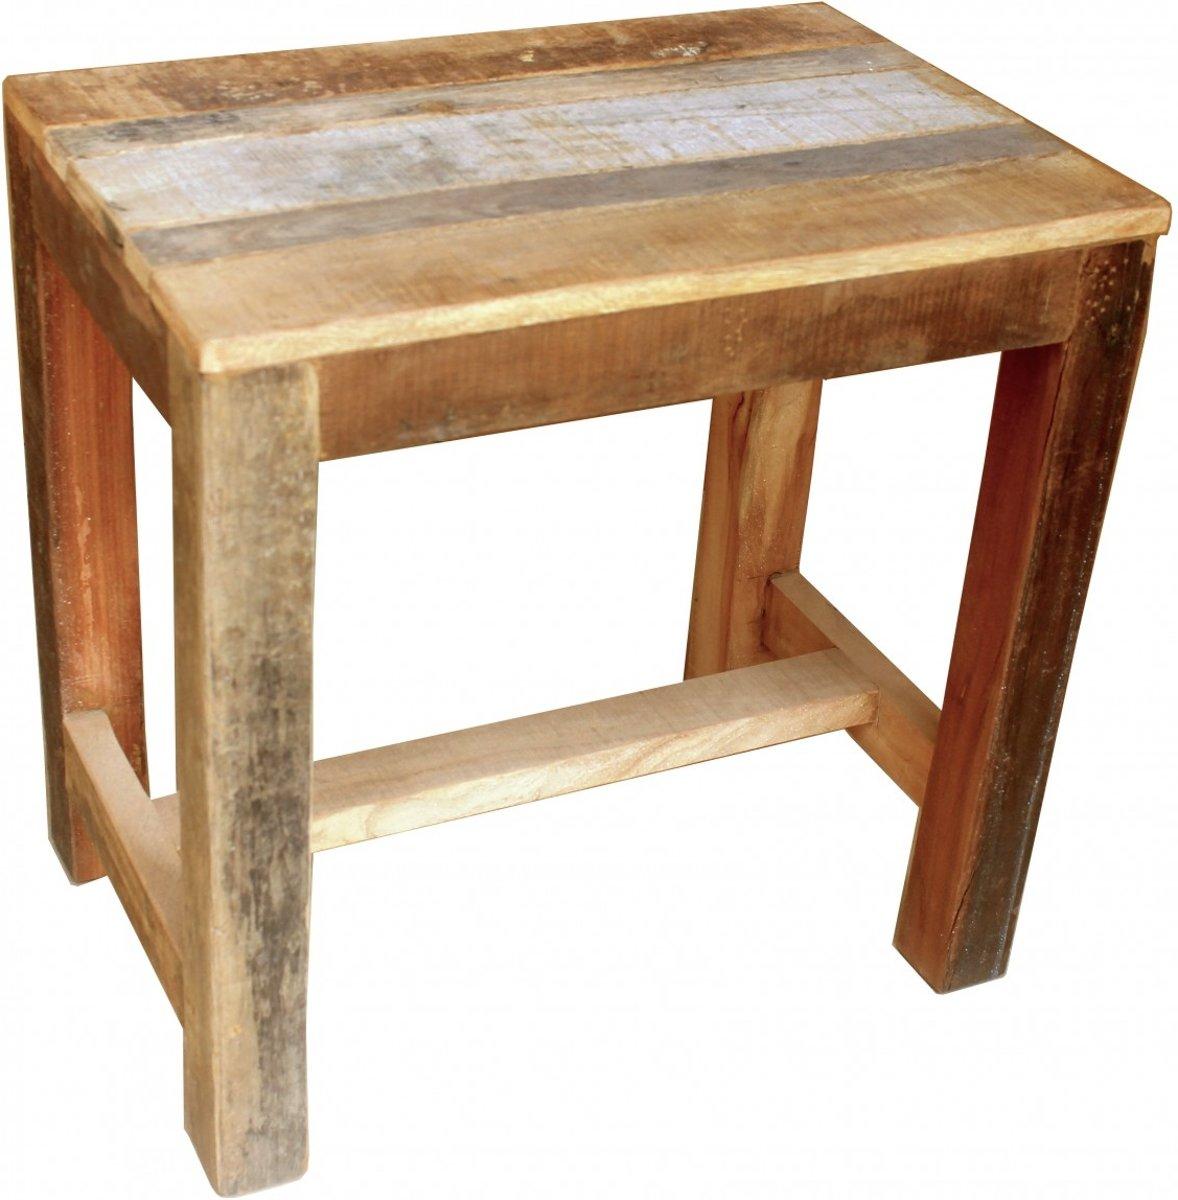 Otentic Design Sloophouten tafel/kruk naturel kopen